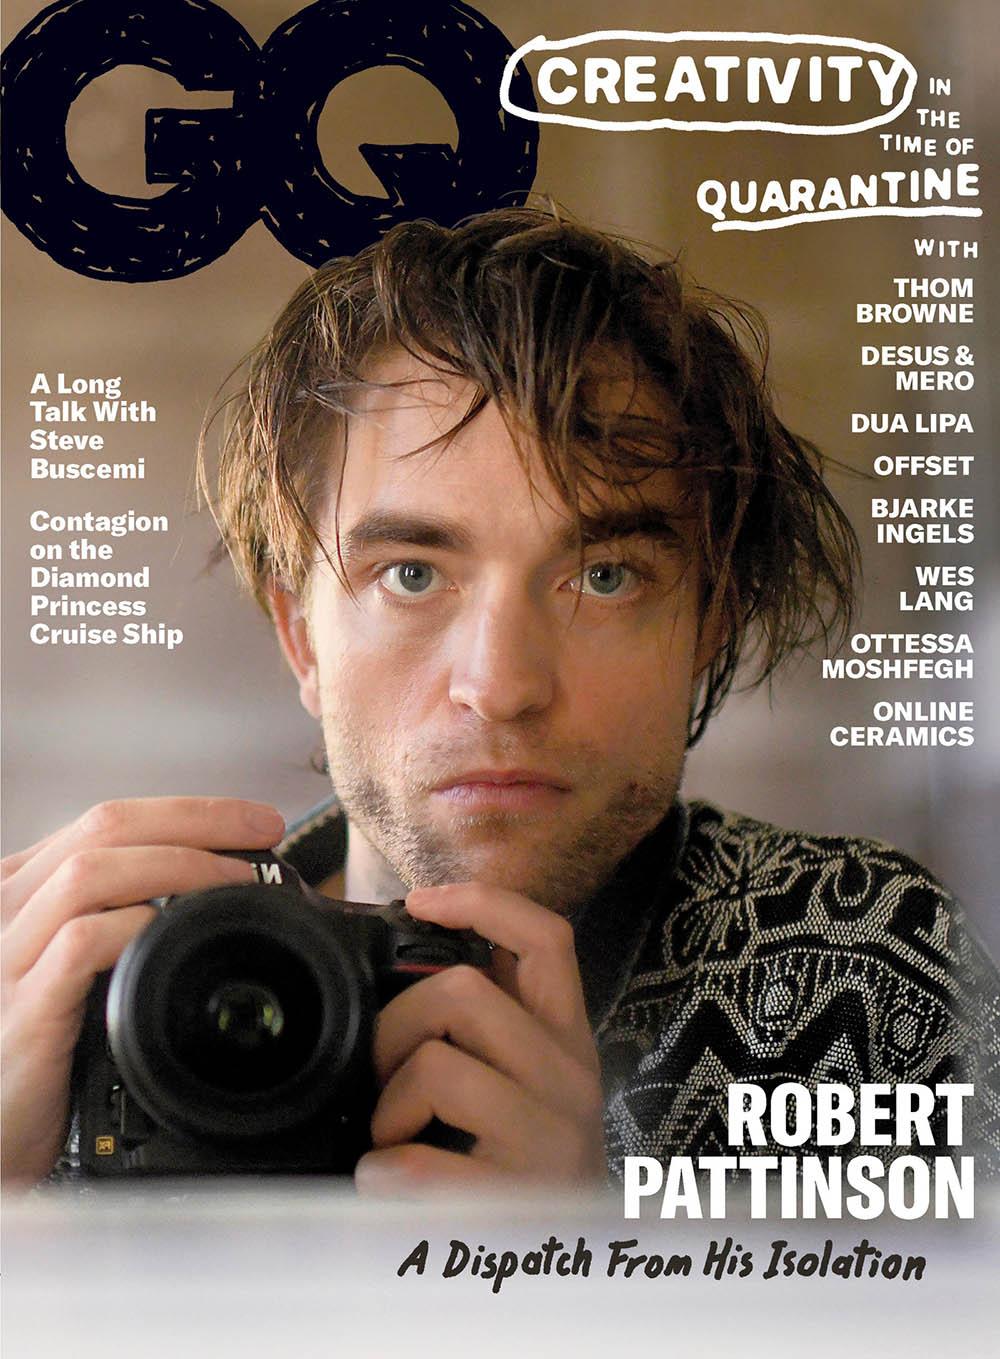 Robert Pattinson photographs himself for GQ USA June July 2020 cover